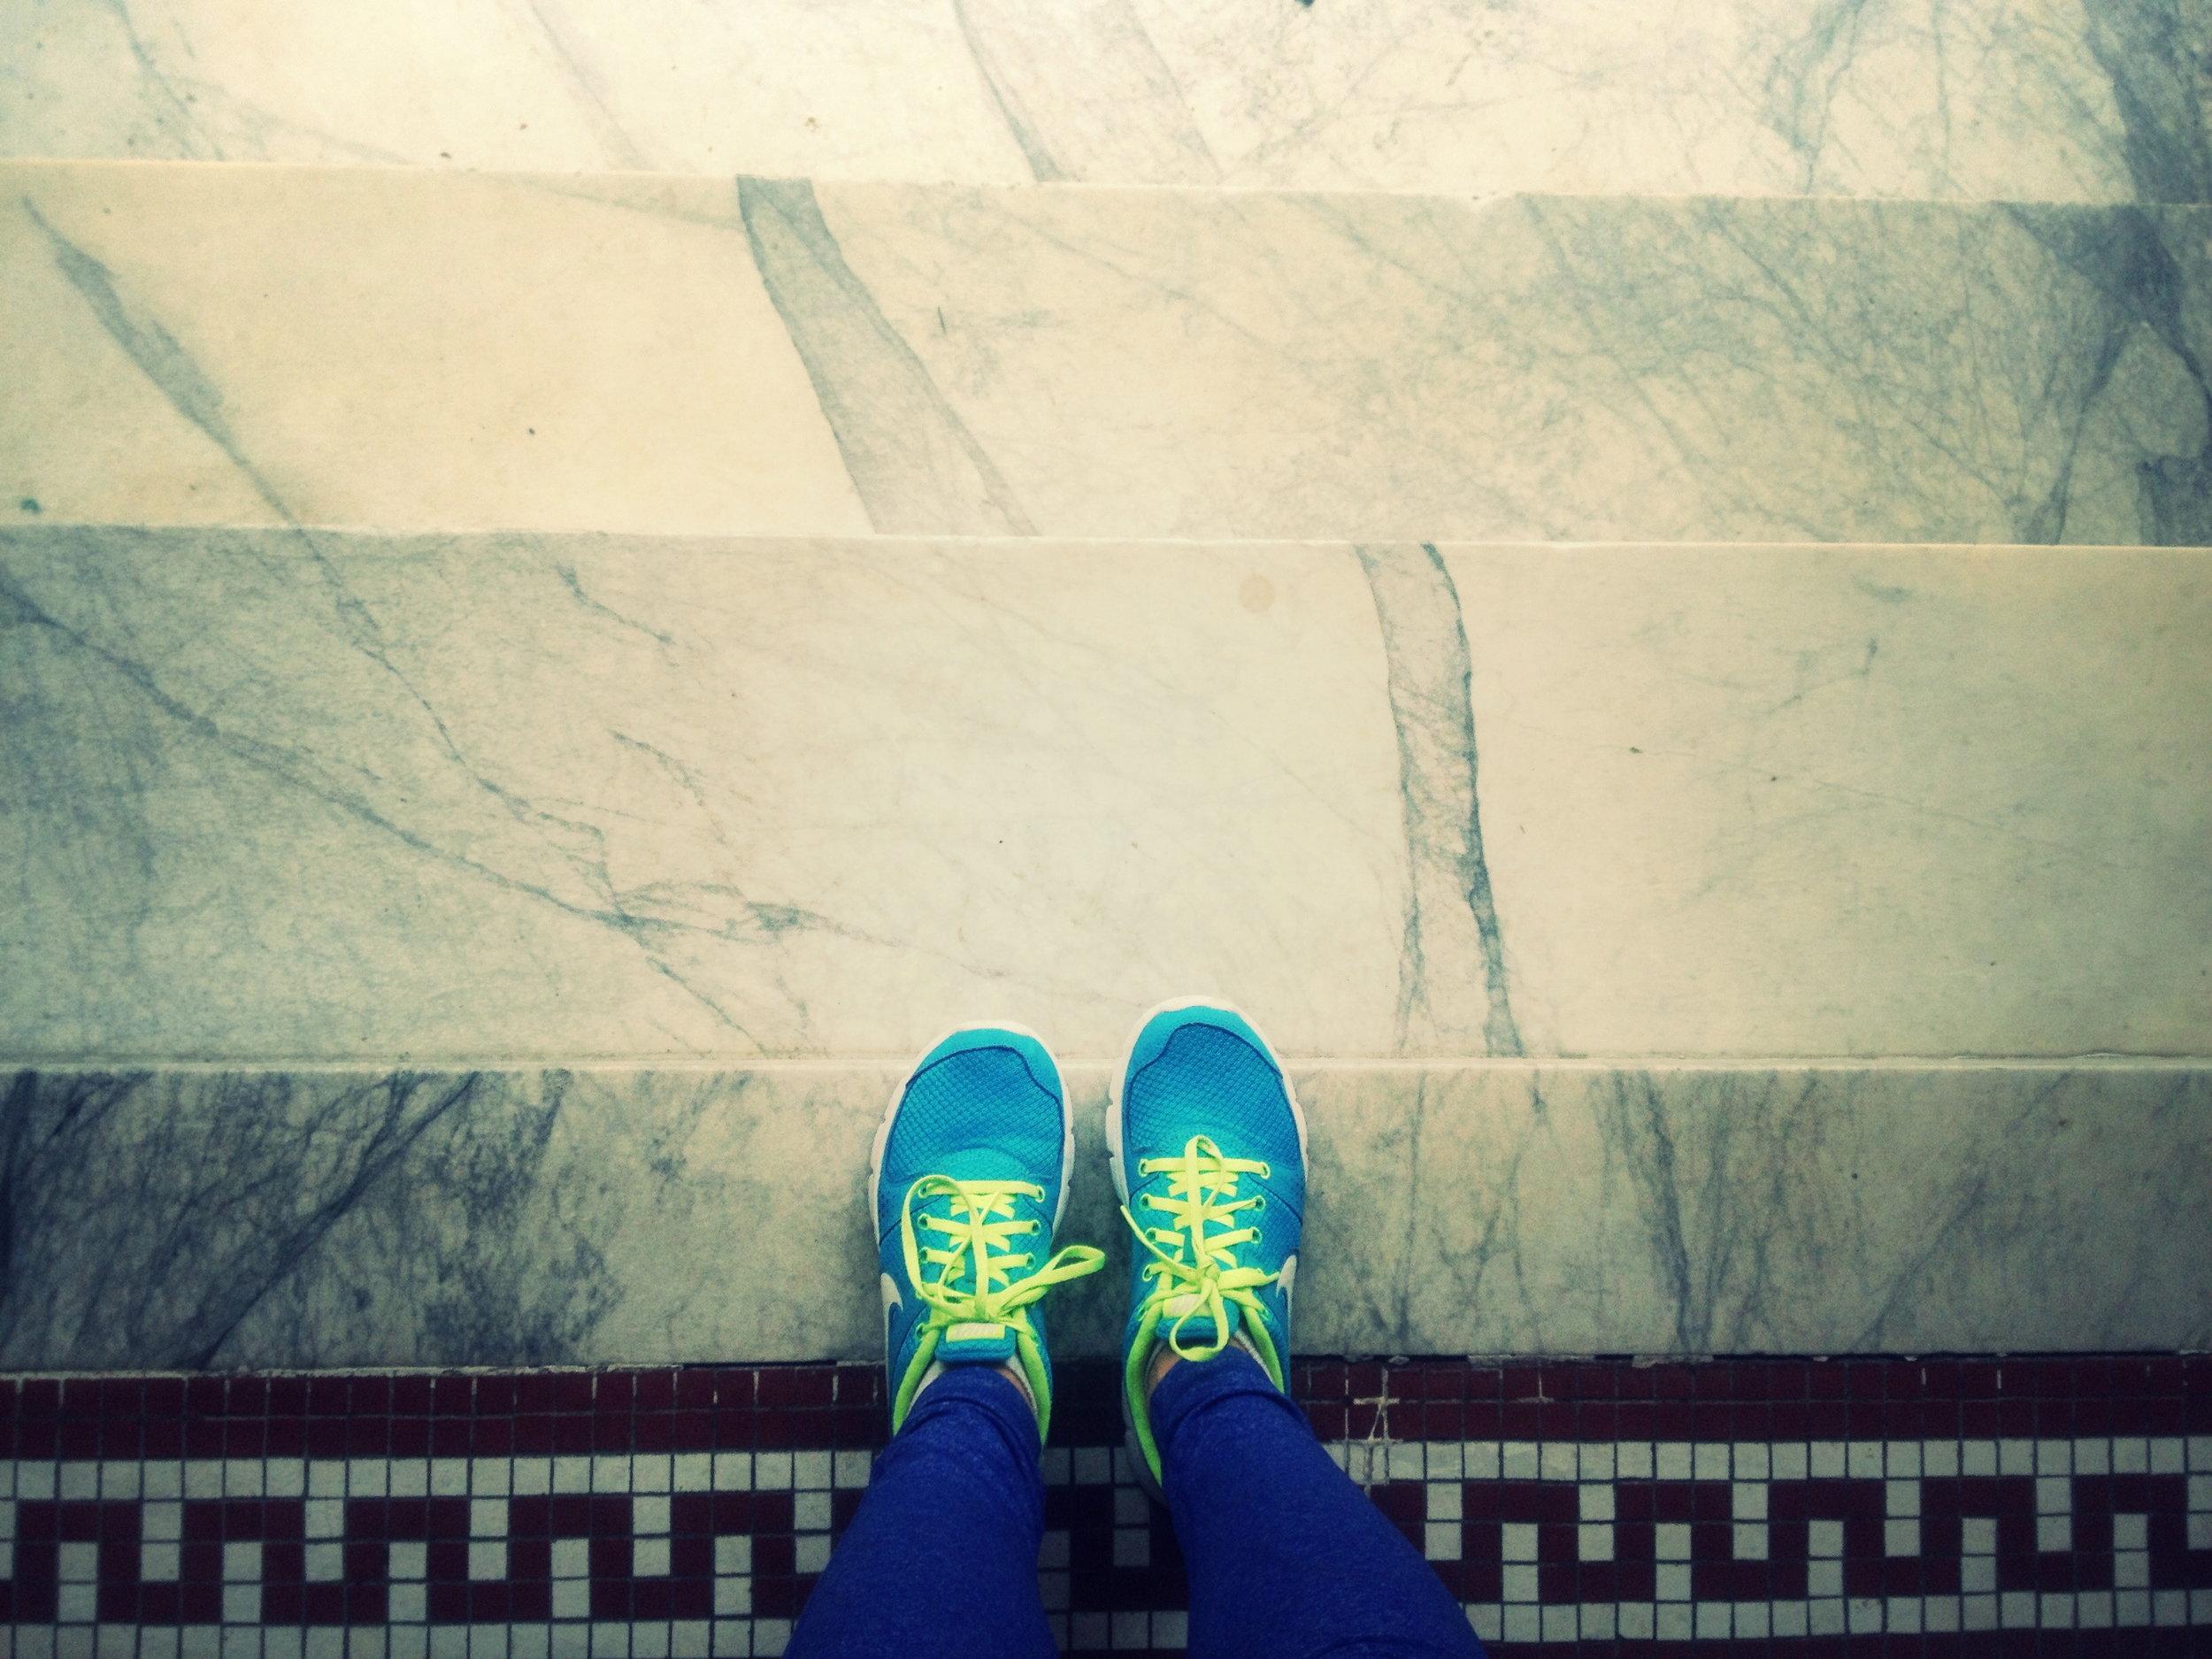 Somehow these Nike Lunarglides make running just a bit more enjoyable.